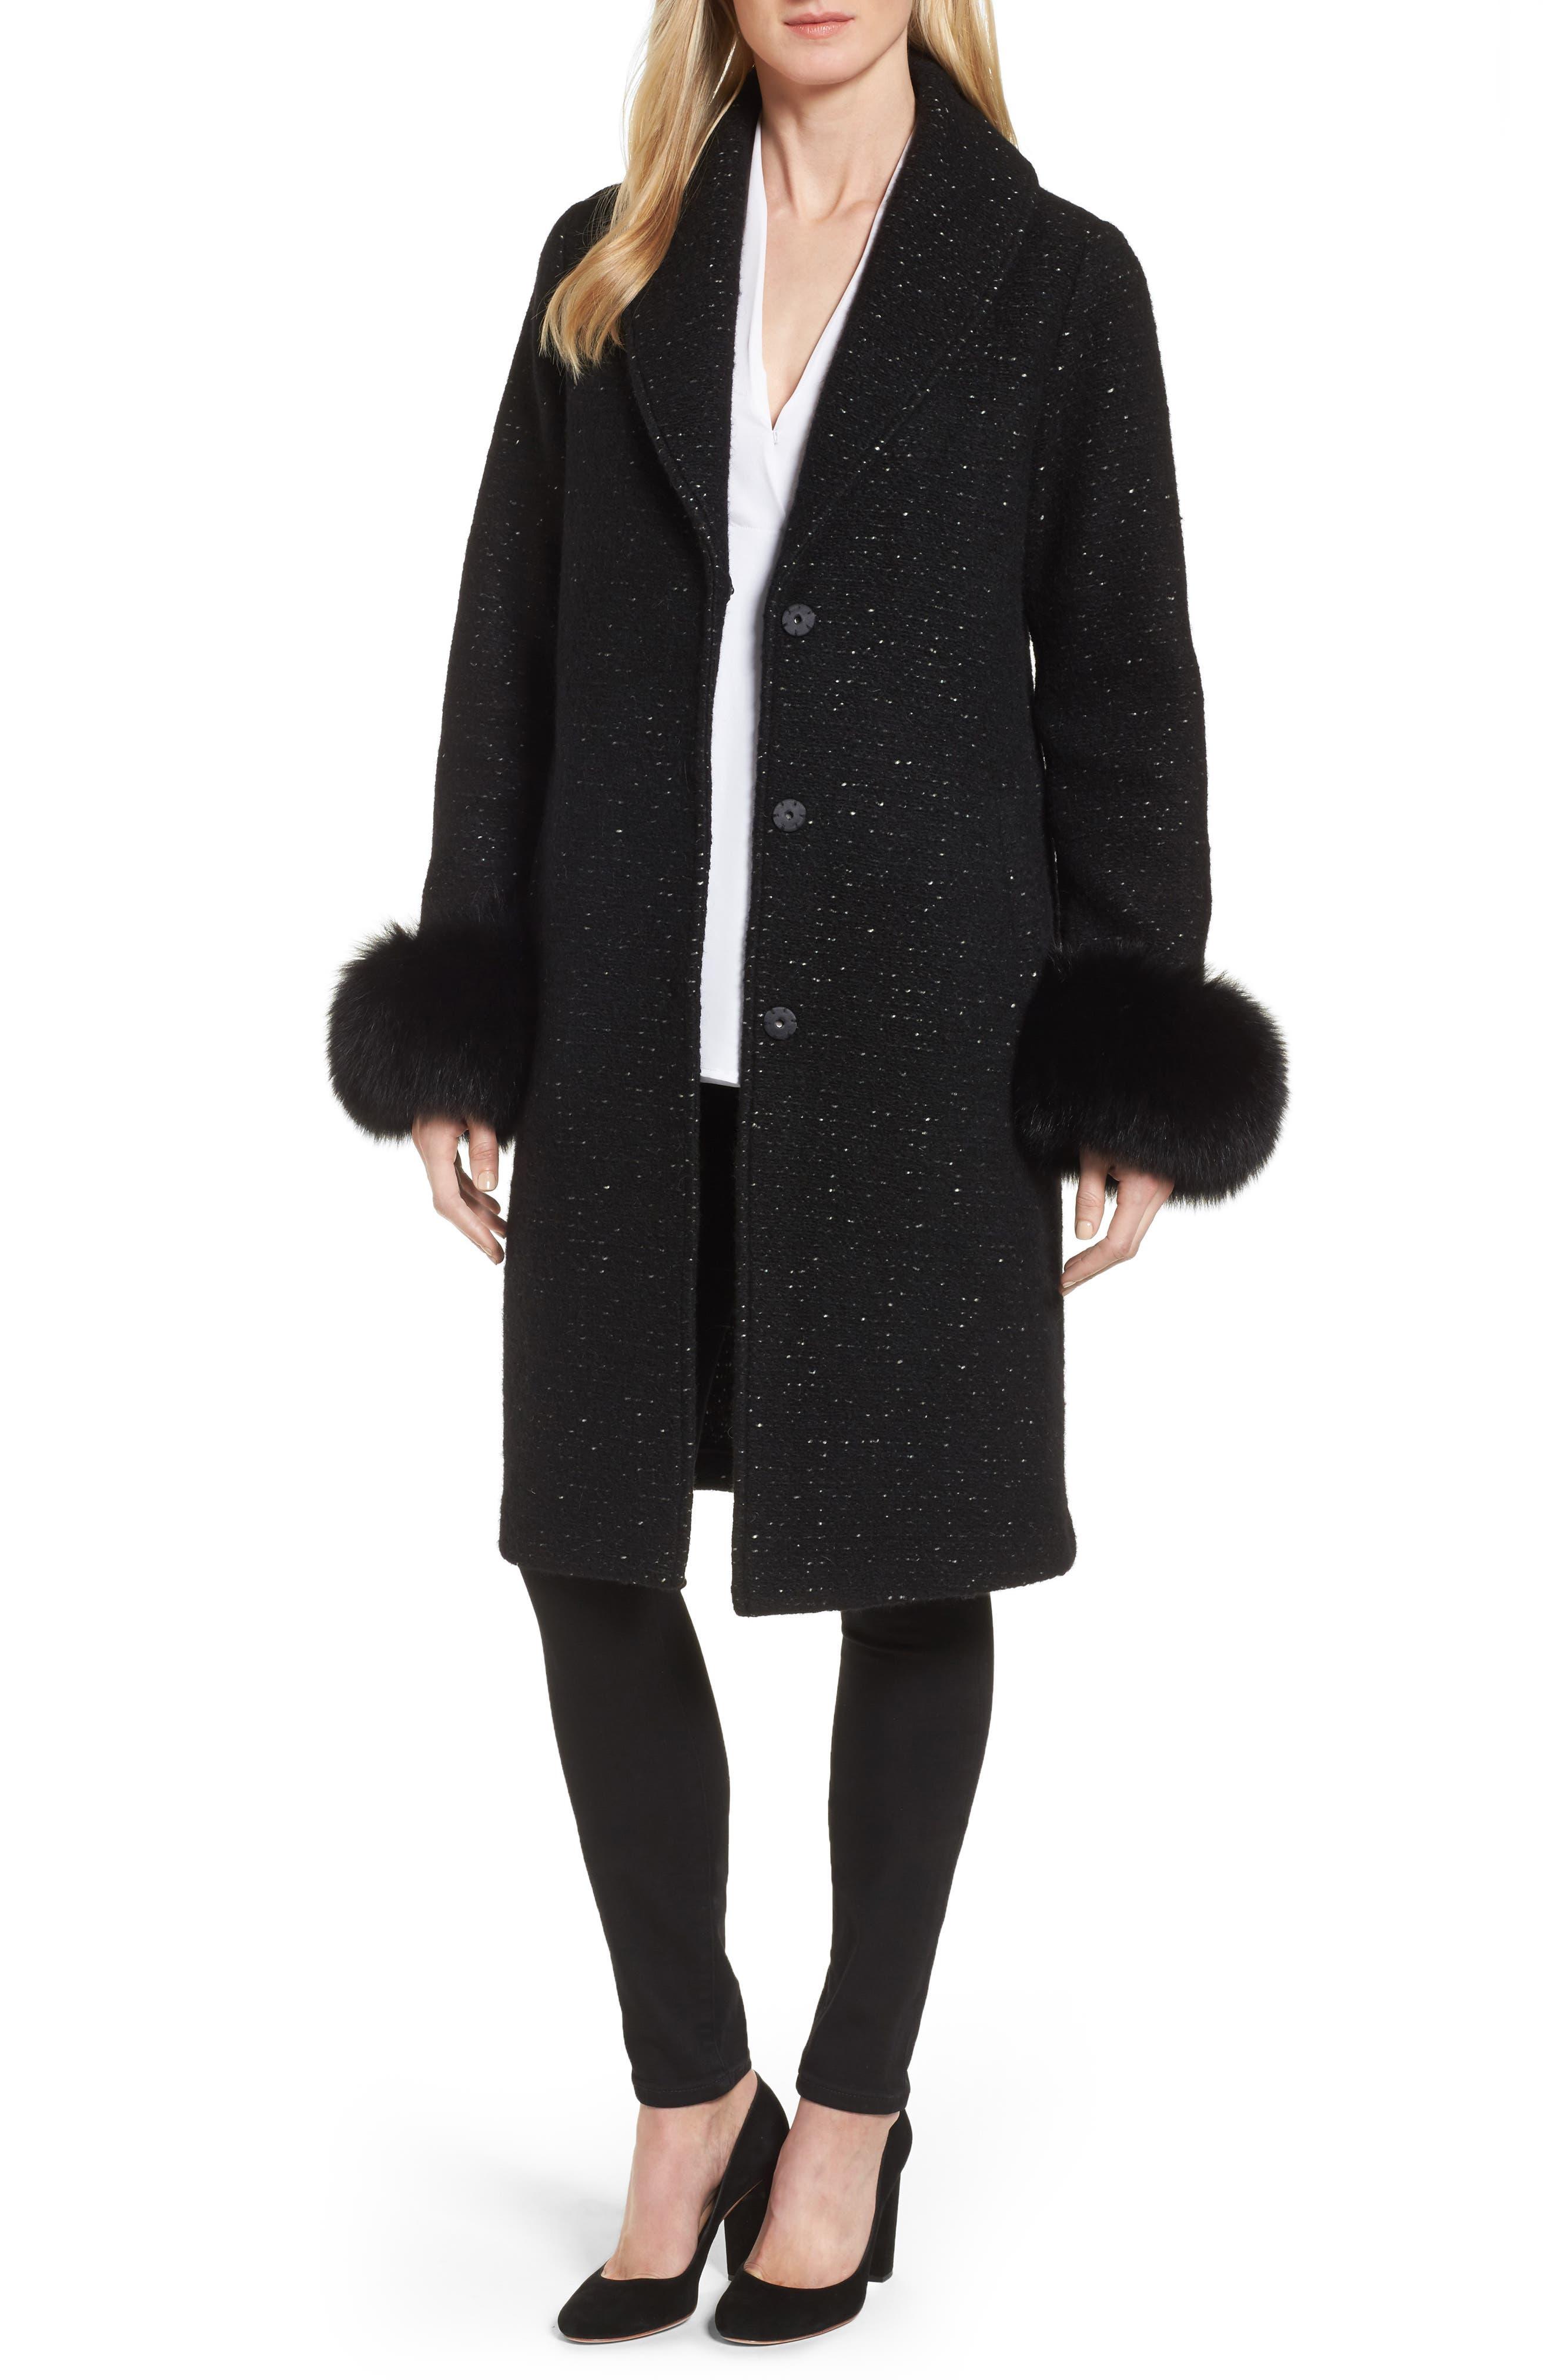 ELIE TAHARI Grace Genuine Fox Fur Trim Knit Wool Blend Long Coat